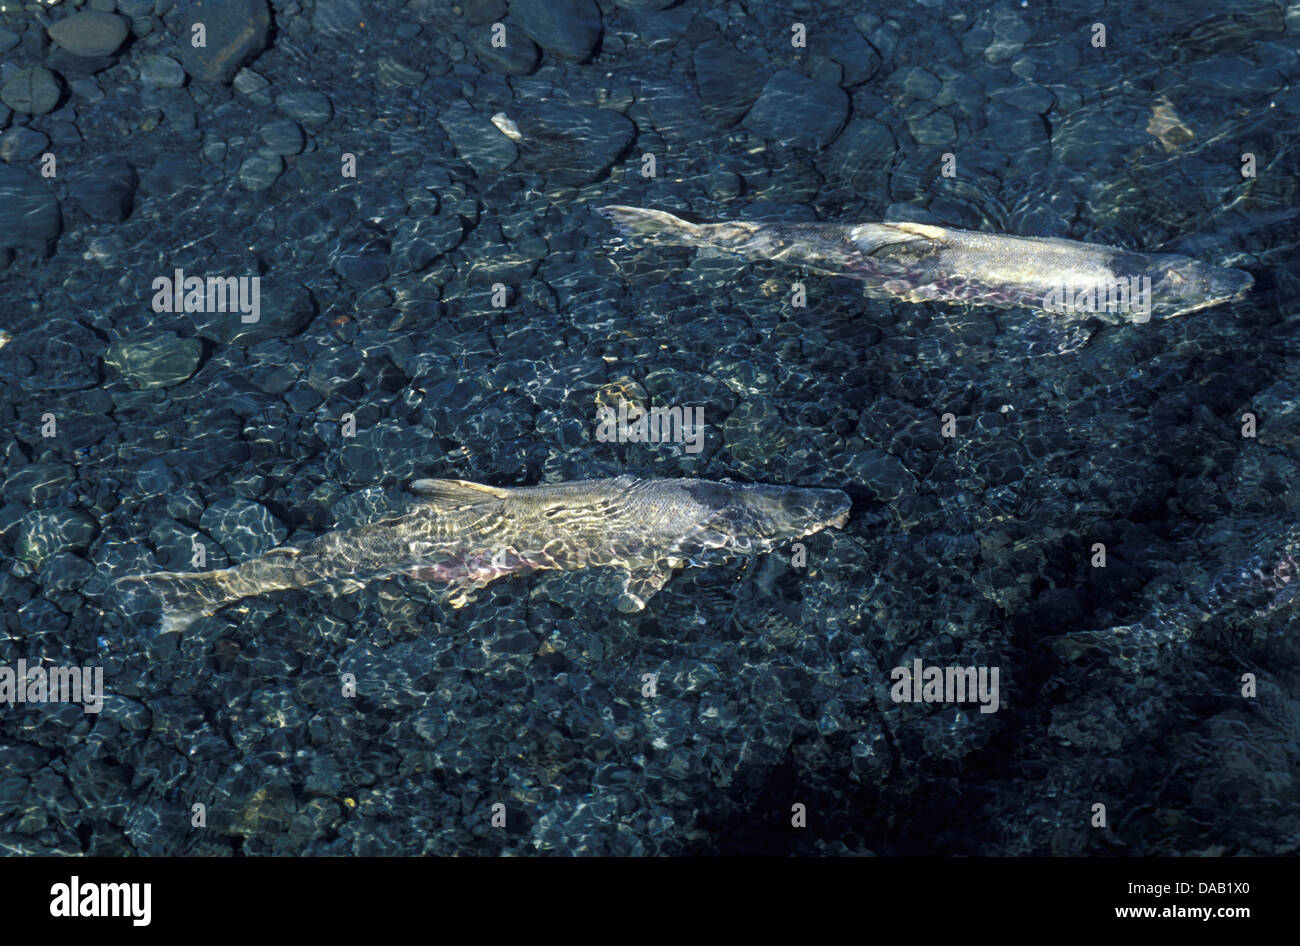 Spawning, Red Salmon, Dog Salmon, Williwaw Creek, Alaska, USA, fish, salmon, water, nature, sunny - Stock Image